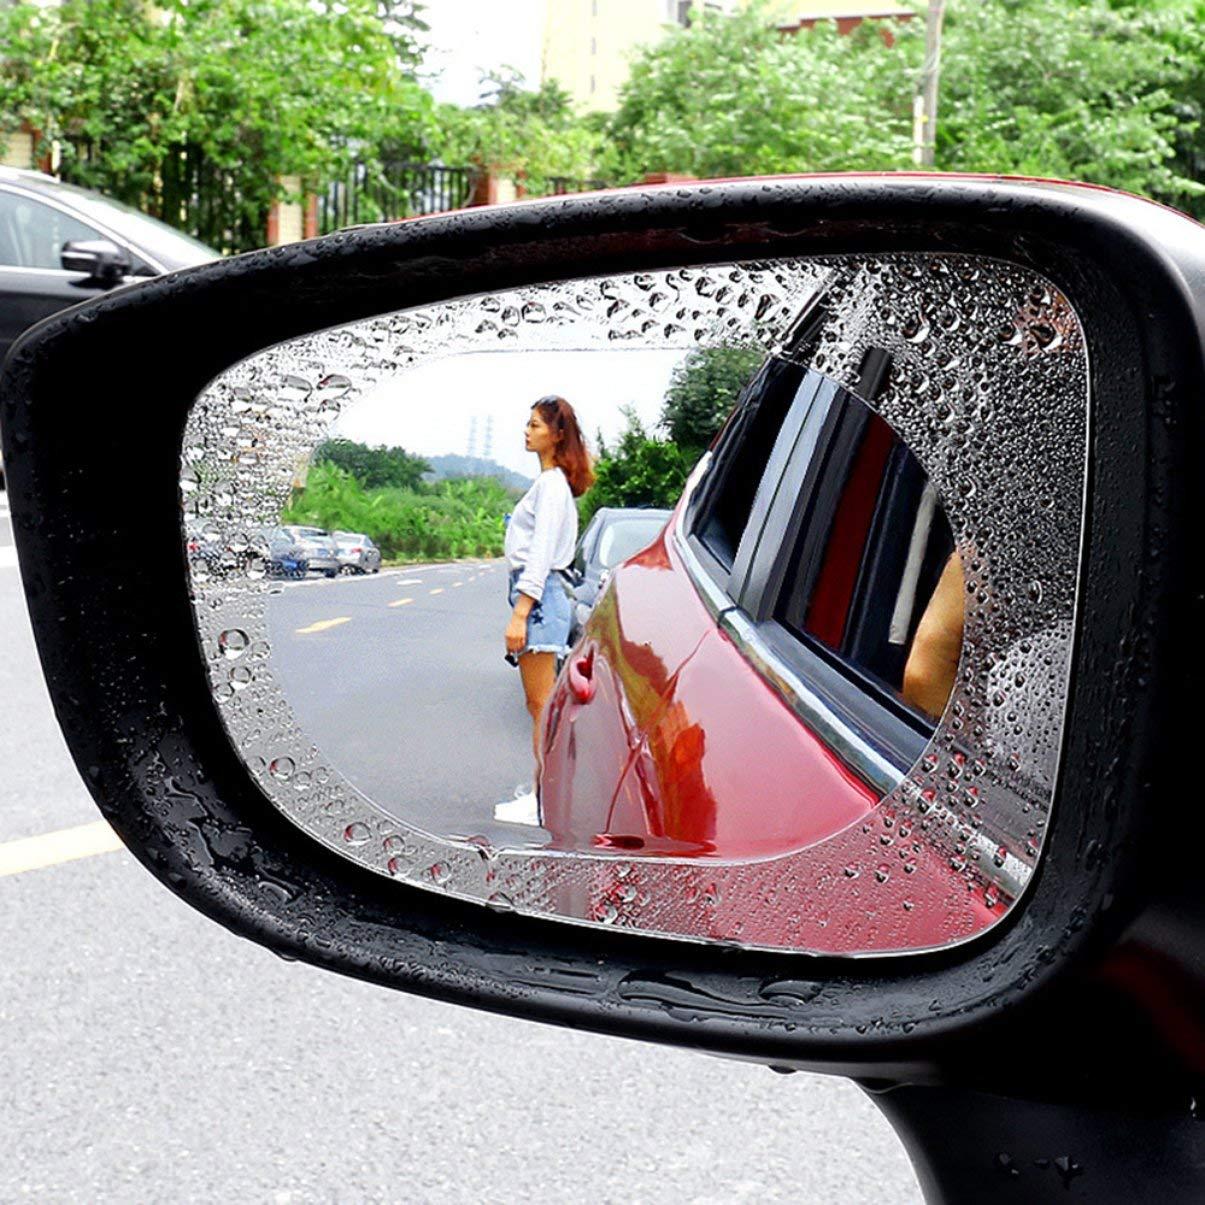 Auto R/ückspiegel Regenschutzfolie Auto R/ückspiegel Regenschutzfolie Regenwasserantrieb Hydrophobe Folie Wasserdichtes Folienpaar